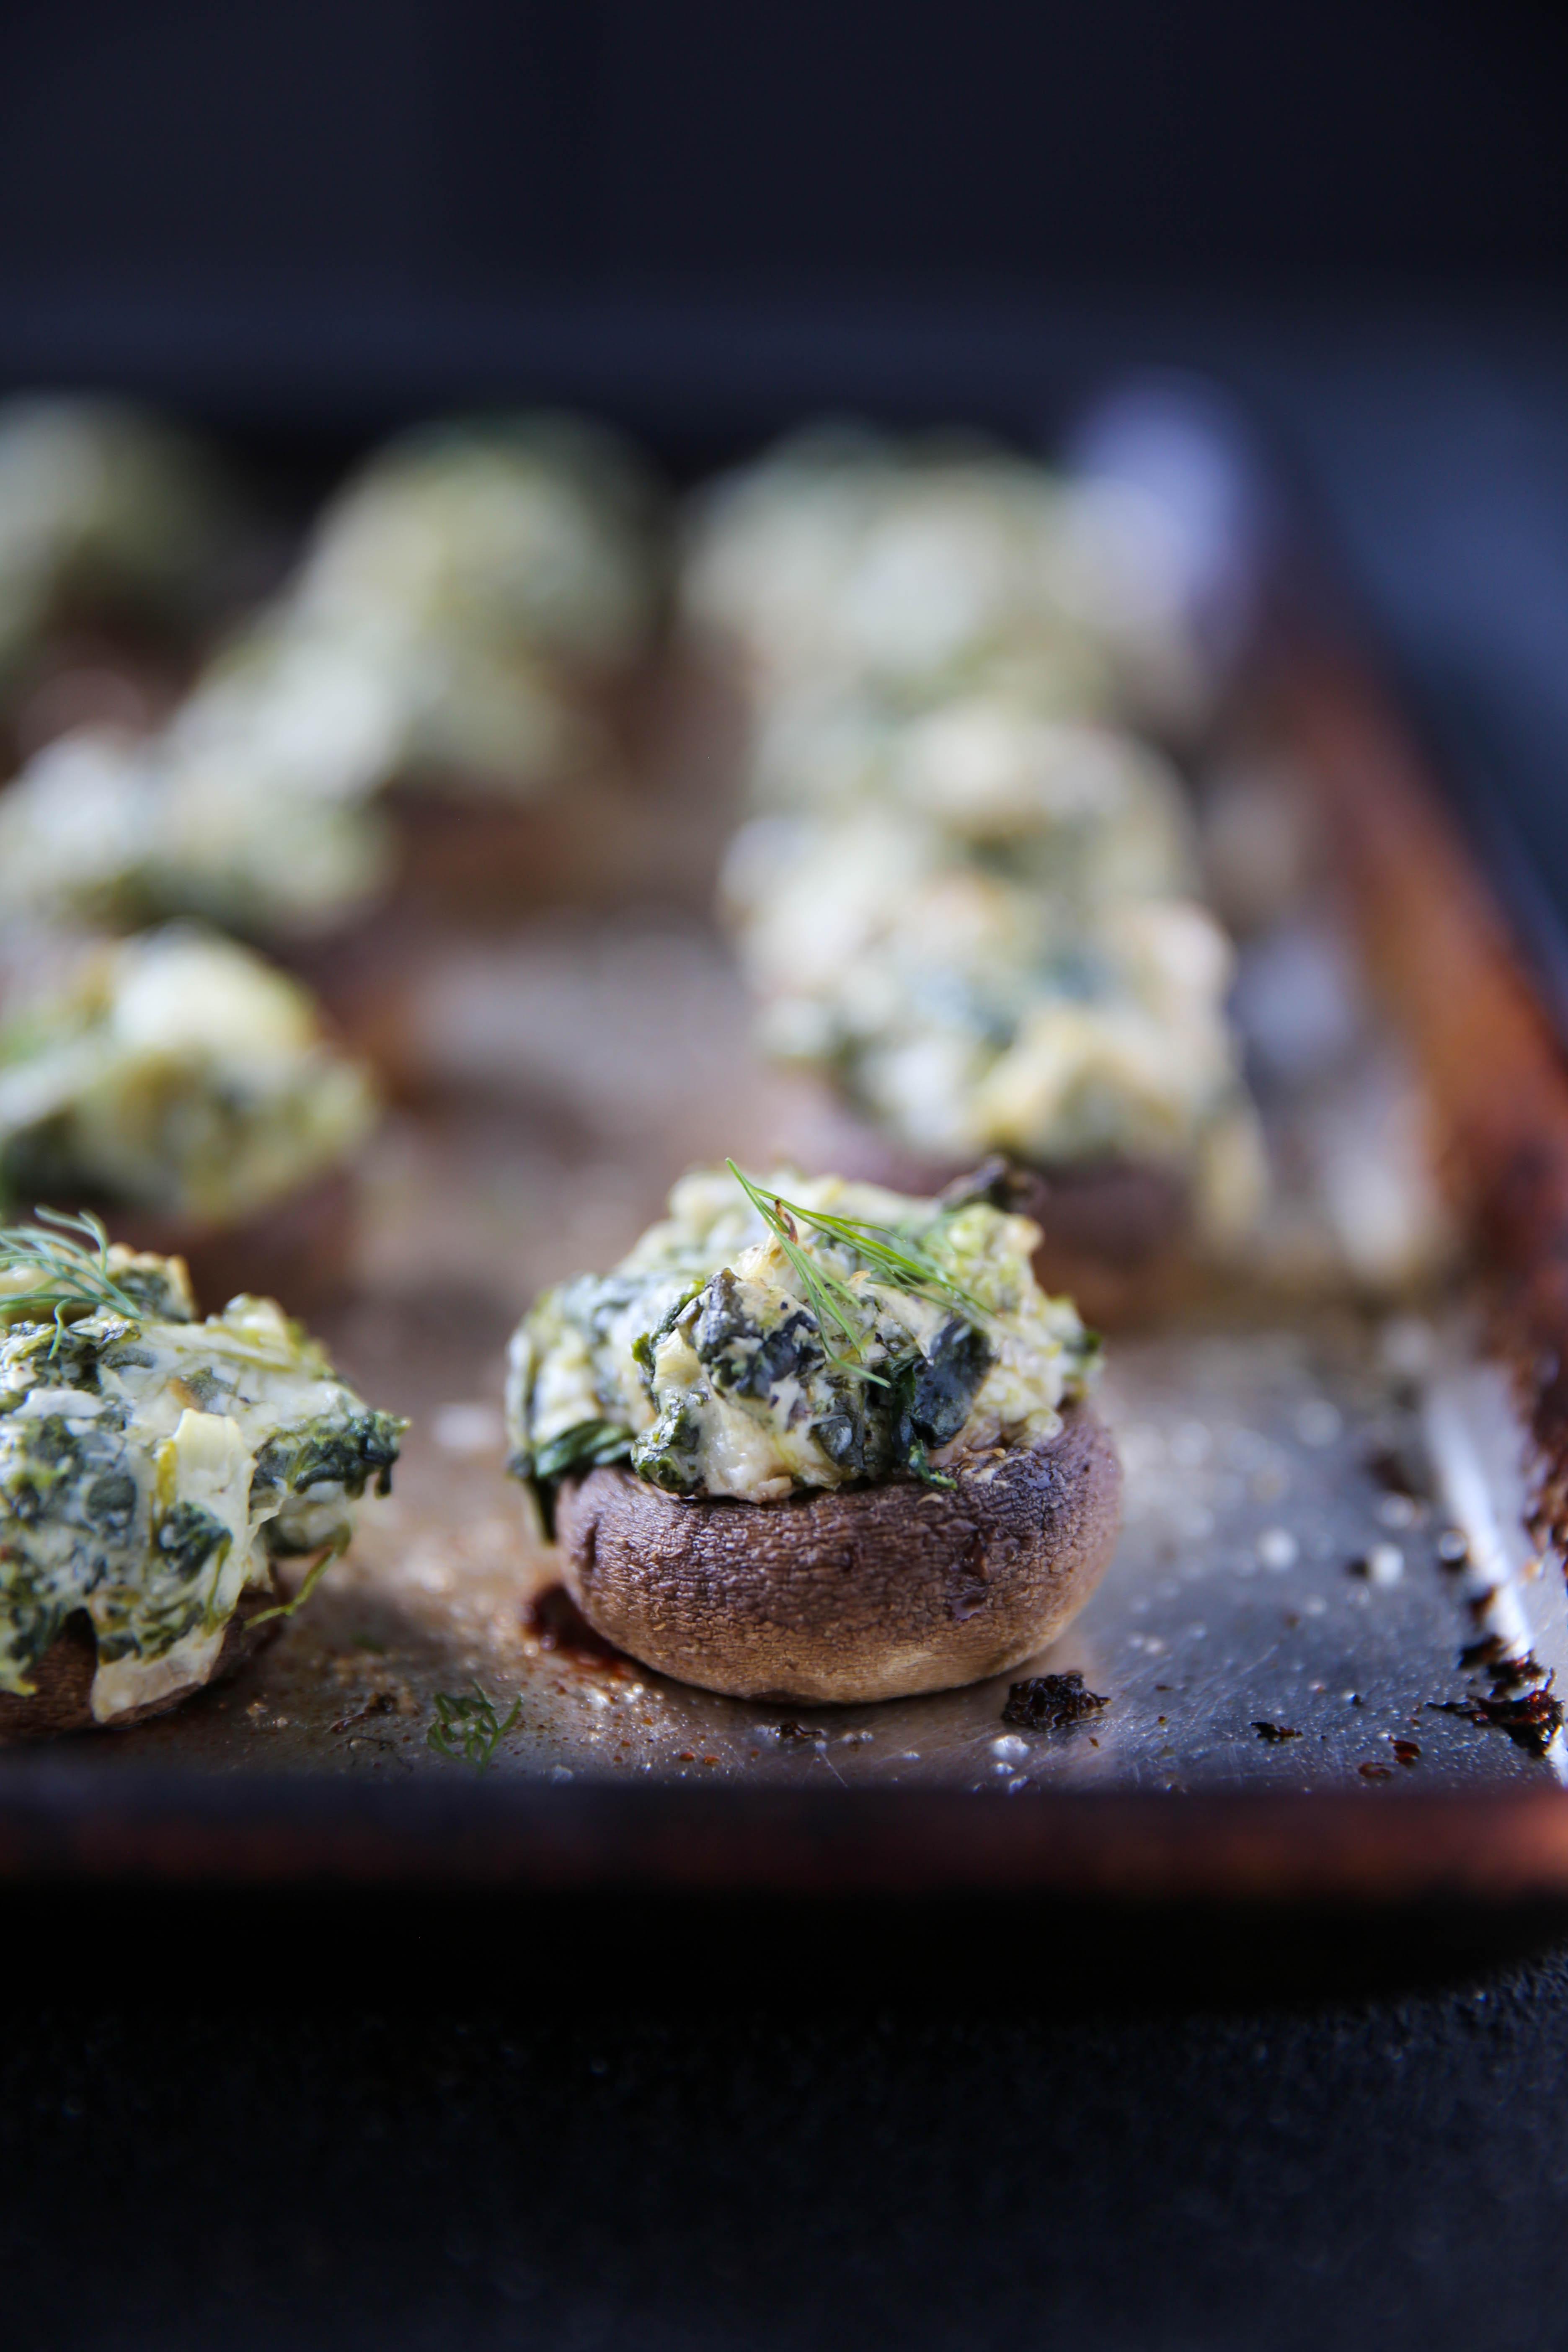 PaleOMG Spinach & Artichoke Stuffed Mushrooms